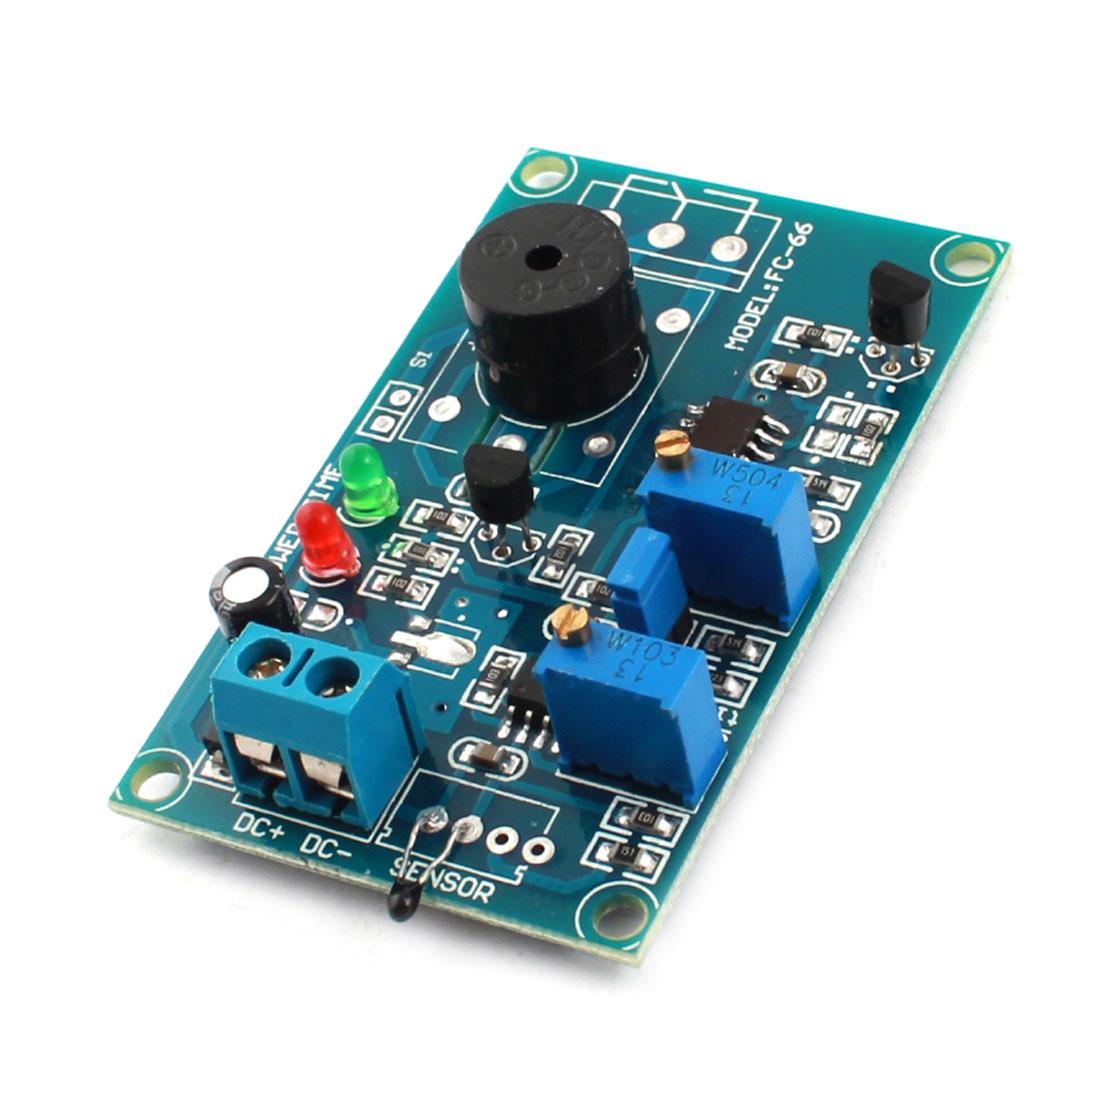 DC 5V 0-20S Pyroelectricity Alarm Buzzer Time Delay PCB Circuit Module